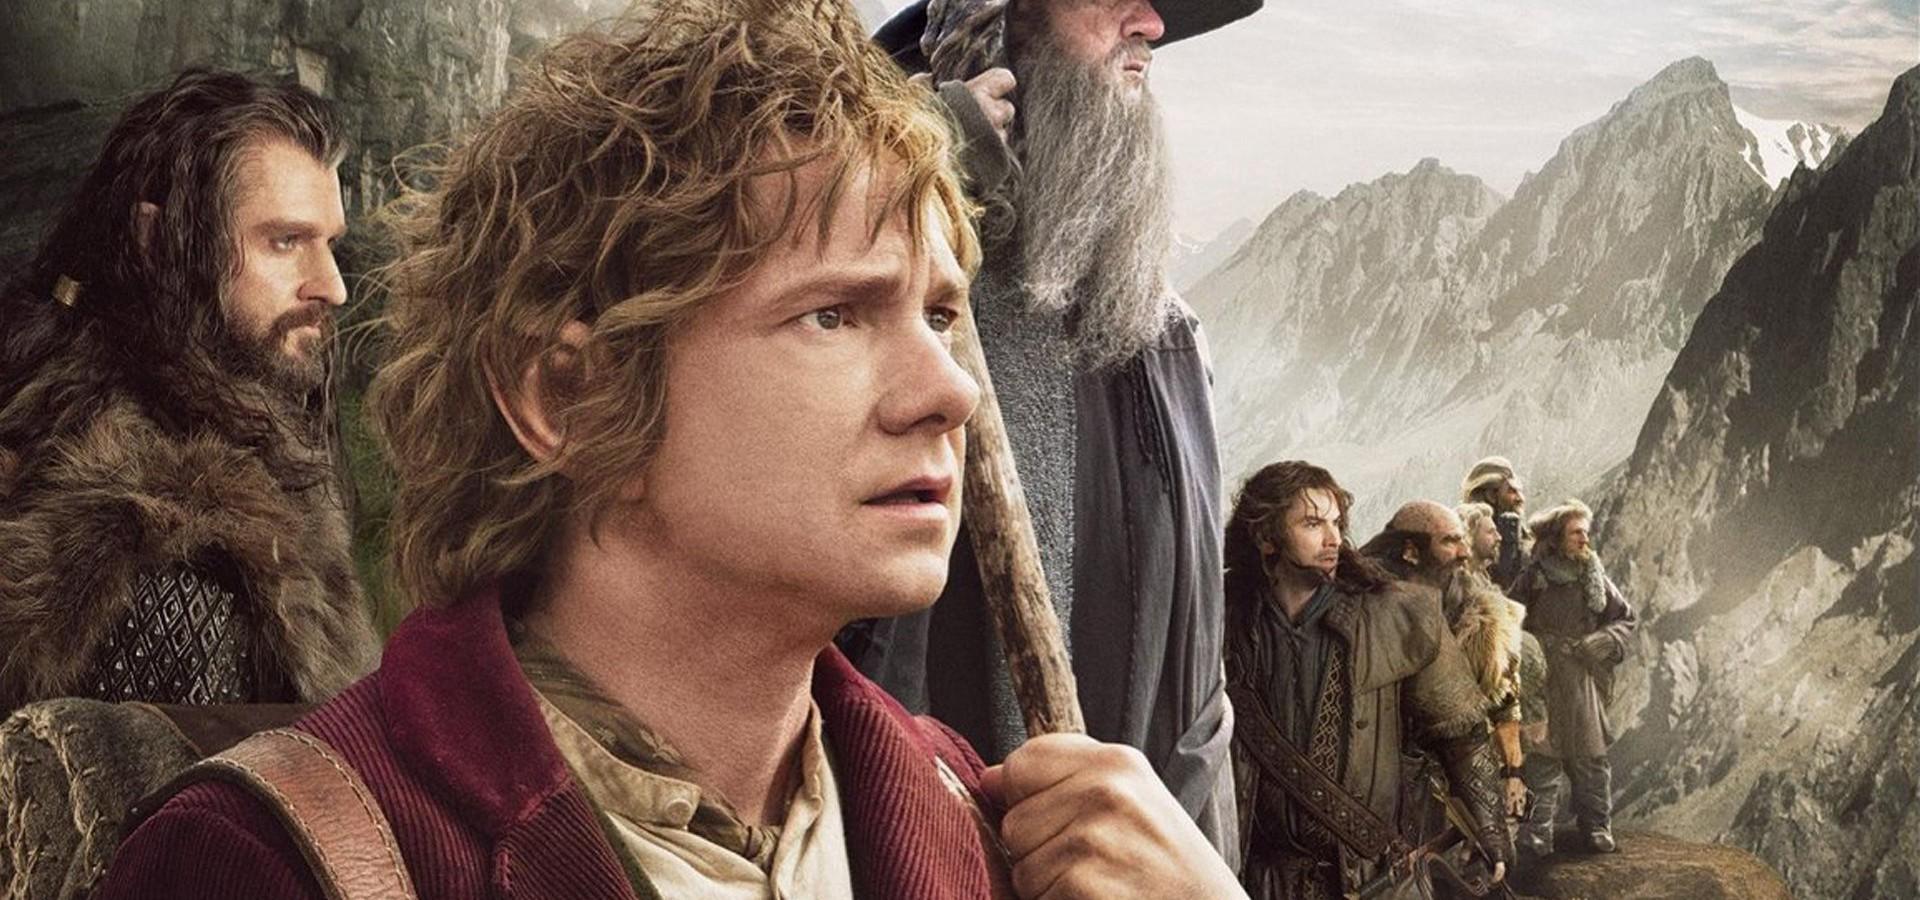 The Hobbit: An Unexpected Journey (3D)